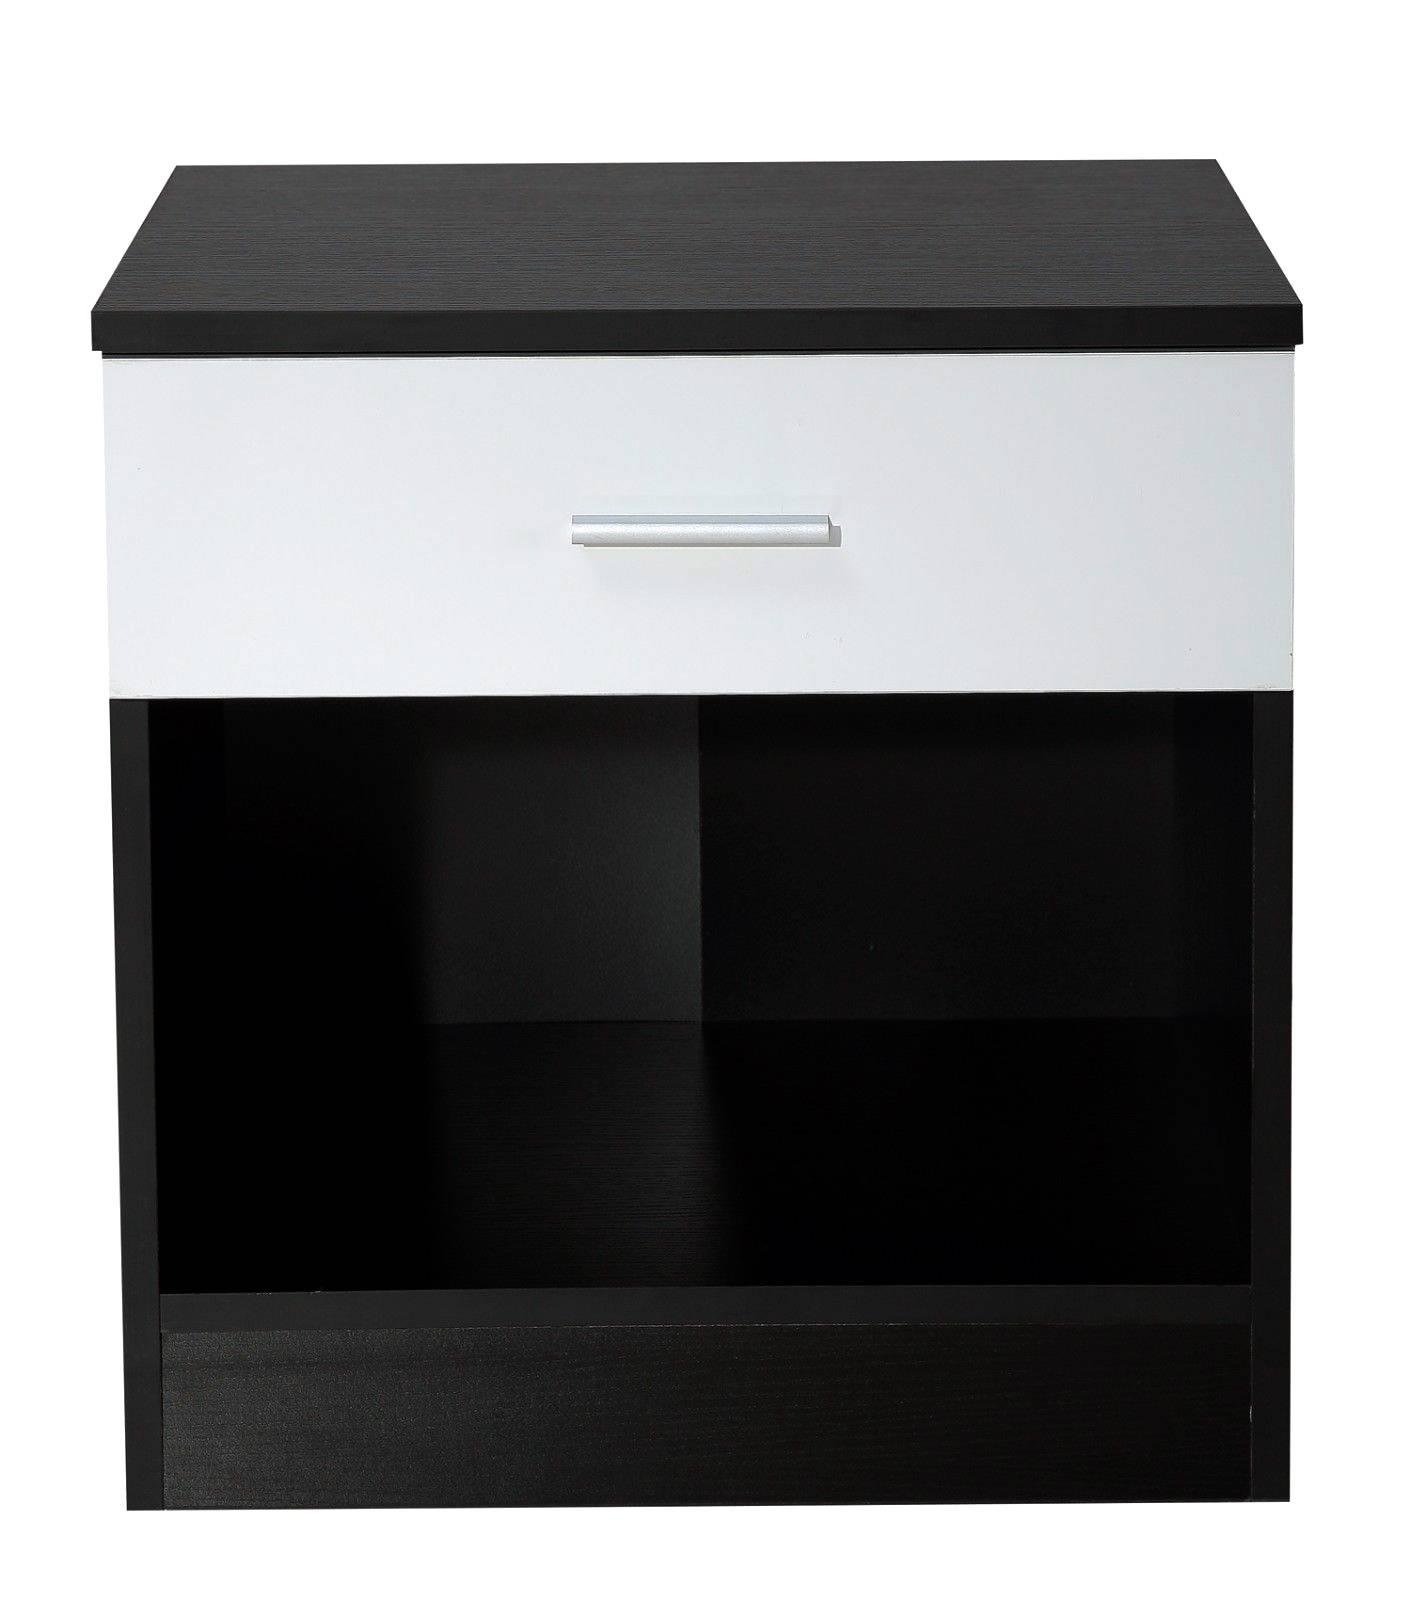 White/black High Gloss Trio 3 Piece Bedroom Furniture Set-Wardrobe regarding Black High Gloss Wardrobes (Image 15 of 15)